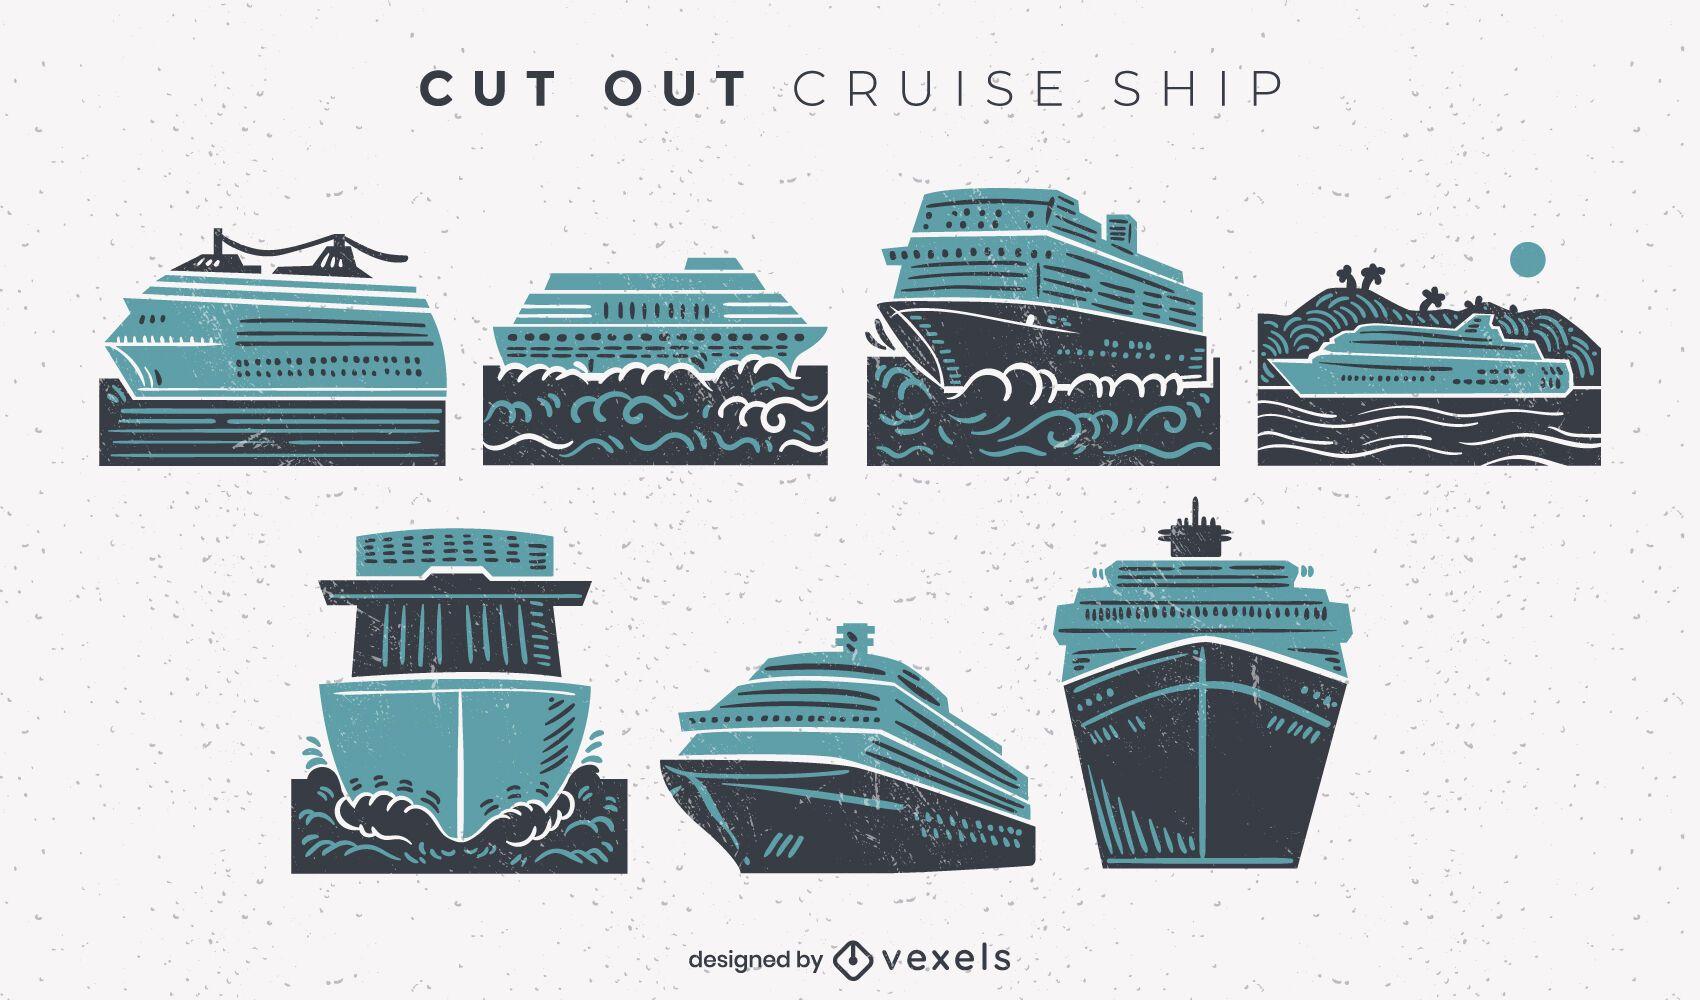 Cruise ship cut-out set